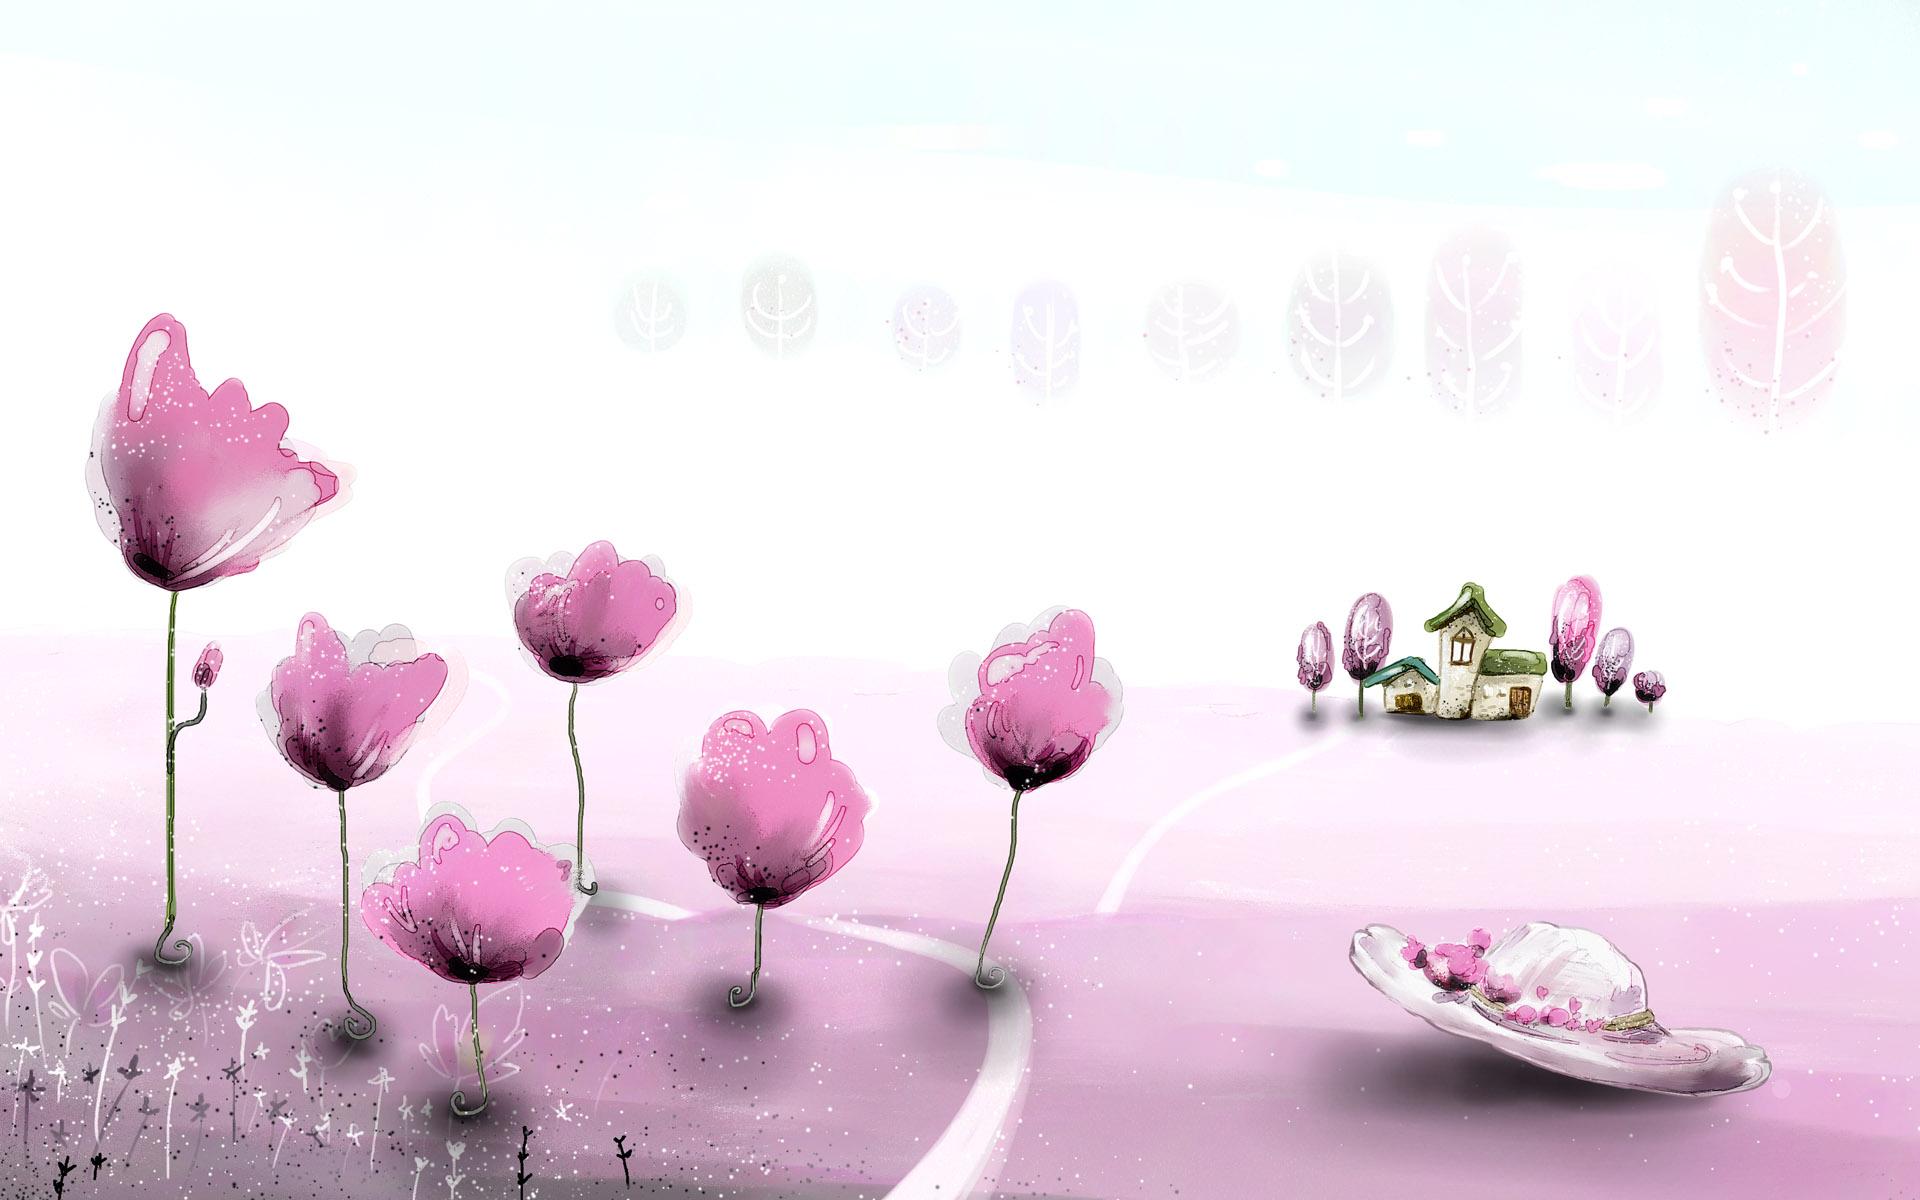 cute desktop backgrounds wallpapers hd live wallpaper hd desktop 1920a—1200